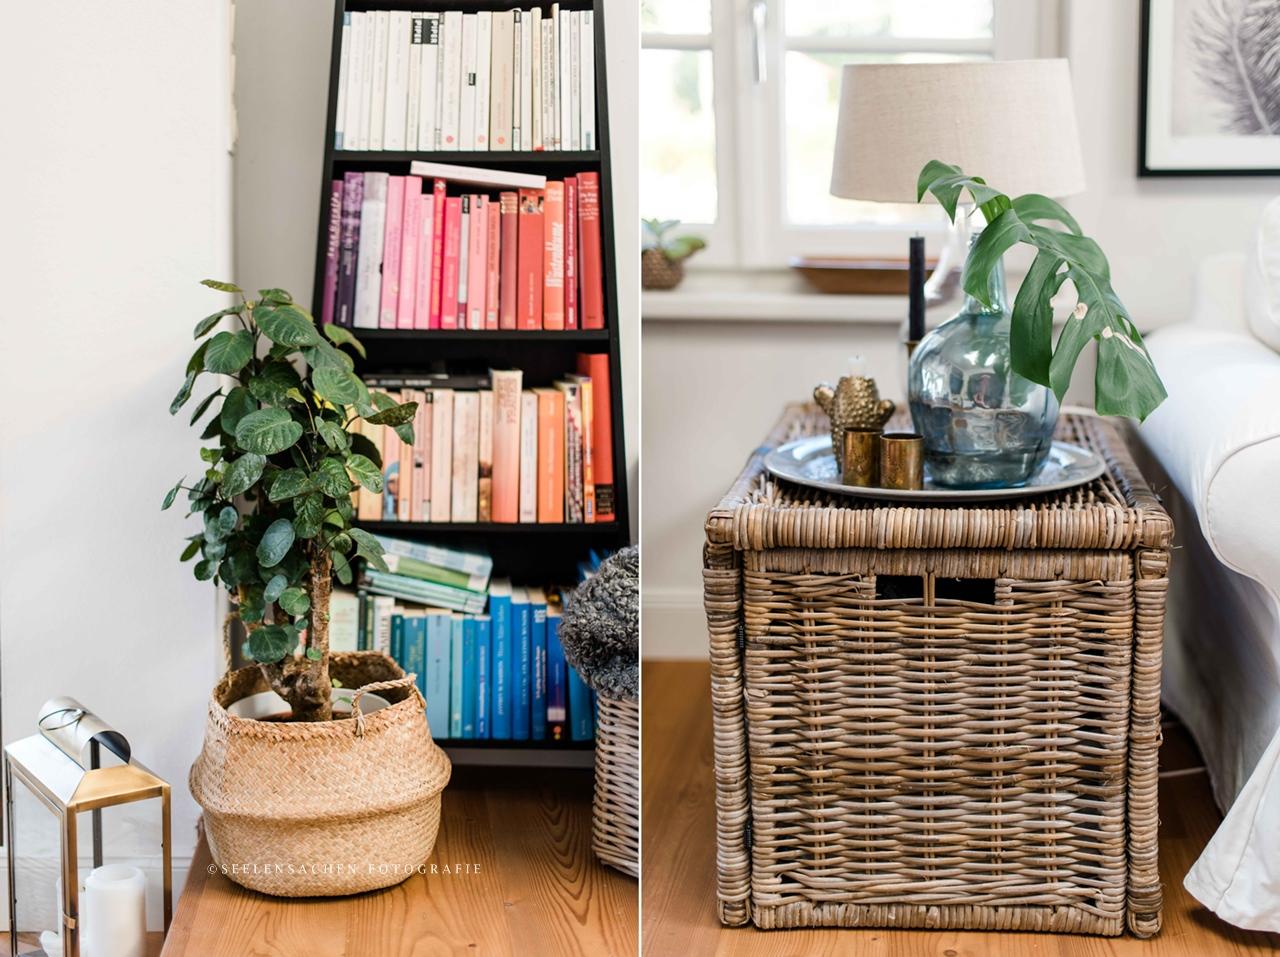 Frühjahrsspecial: It`s green! Zimmerpflanzen